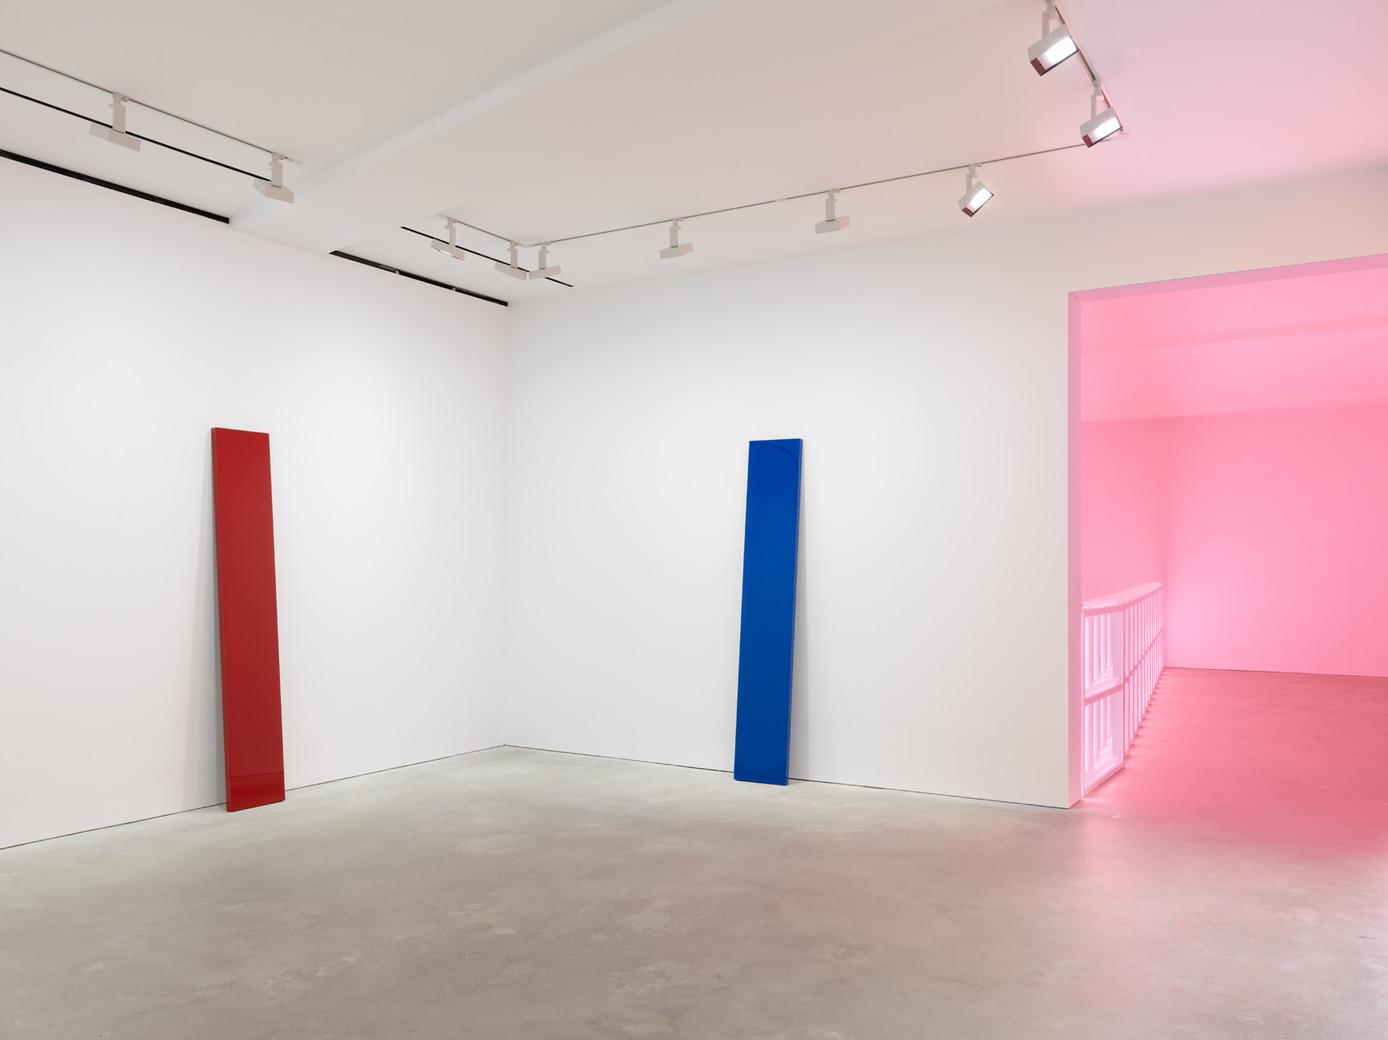 John McCracken and Dan Flavin / David Zwirner Hong Kong